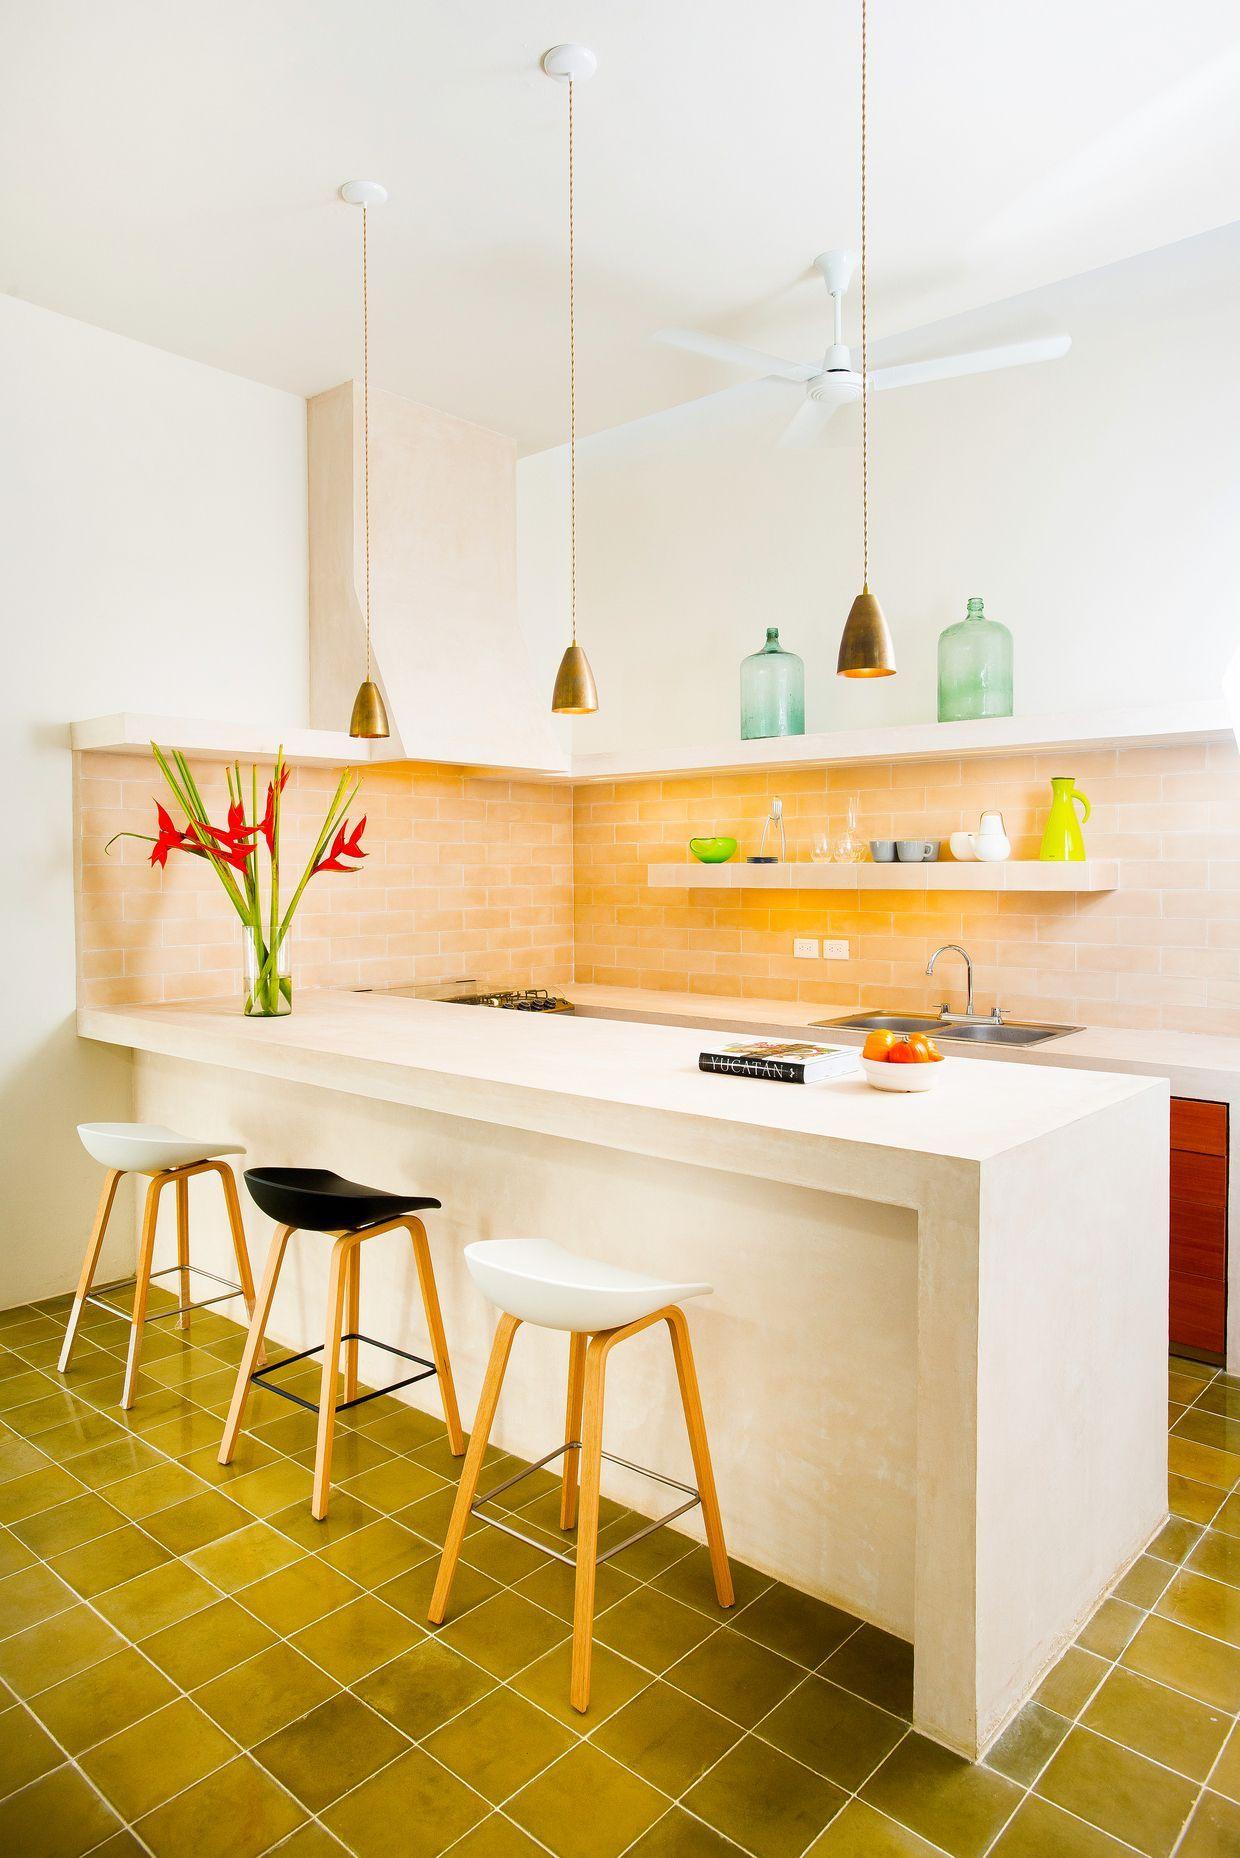 Neat Muebles Merida - Casa Fs55 Modern Home In M Rida Yucat N M Xico By Taller Estilo [mjhdah]https://s-media-cache-ak0.pinimg.com/originals/46/05/8f/46058f5a135531a0598fedc95d51fdce.jpg